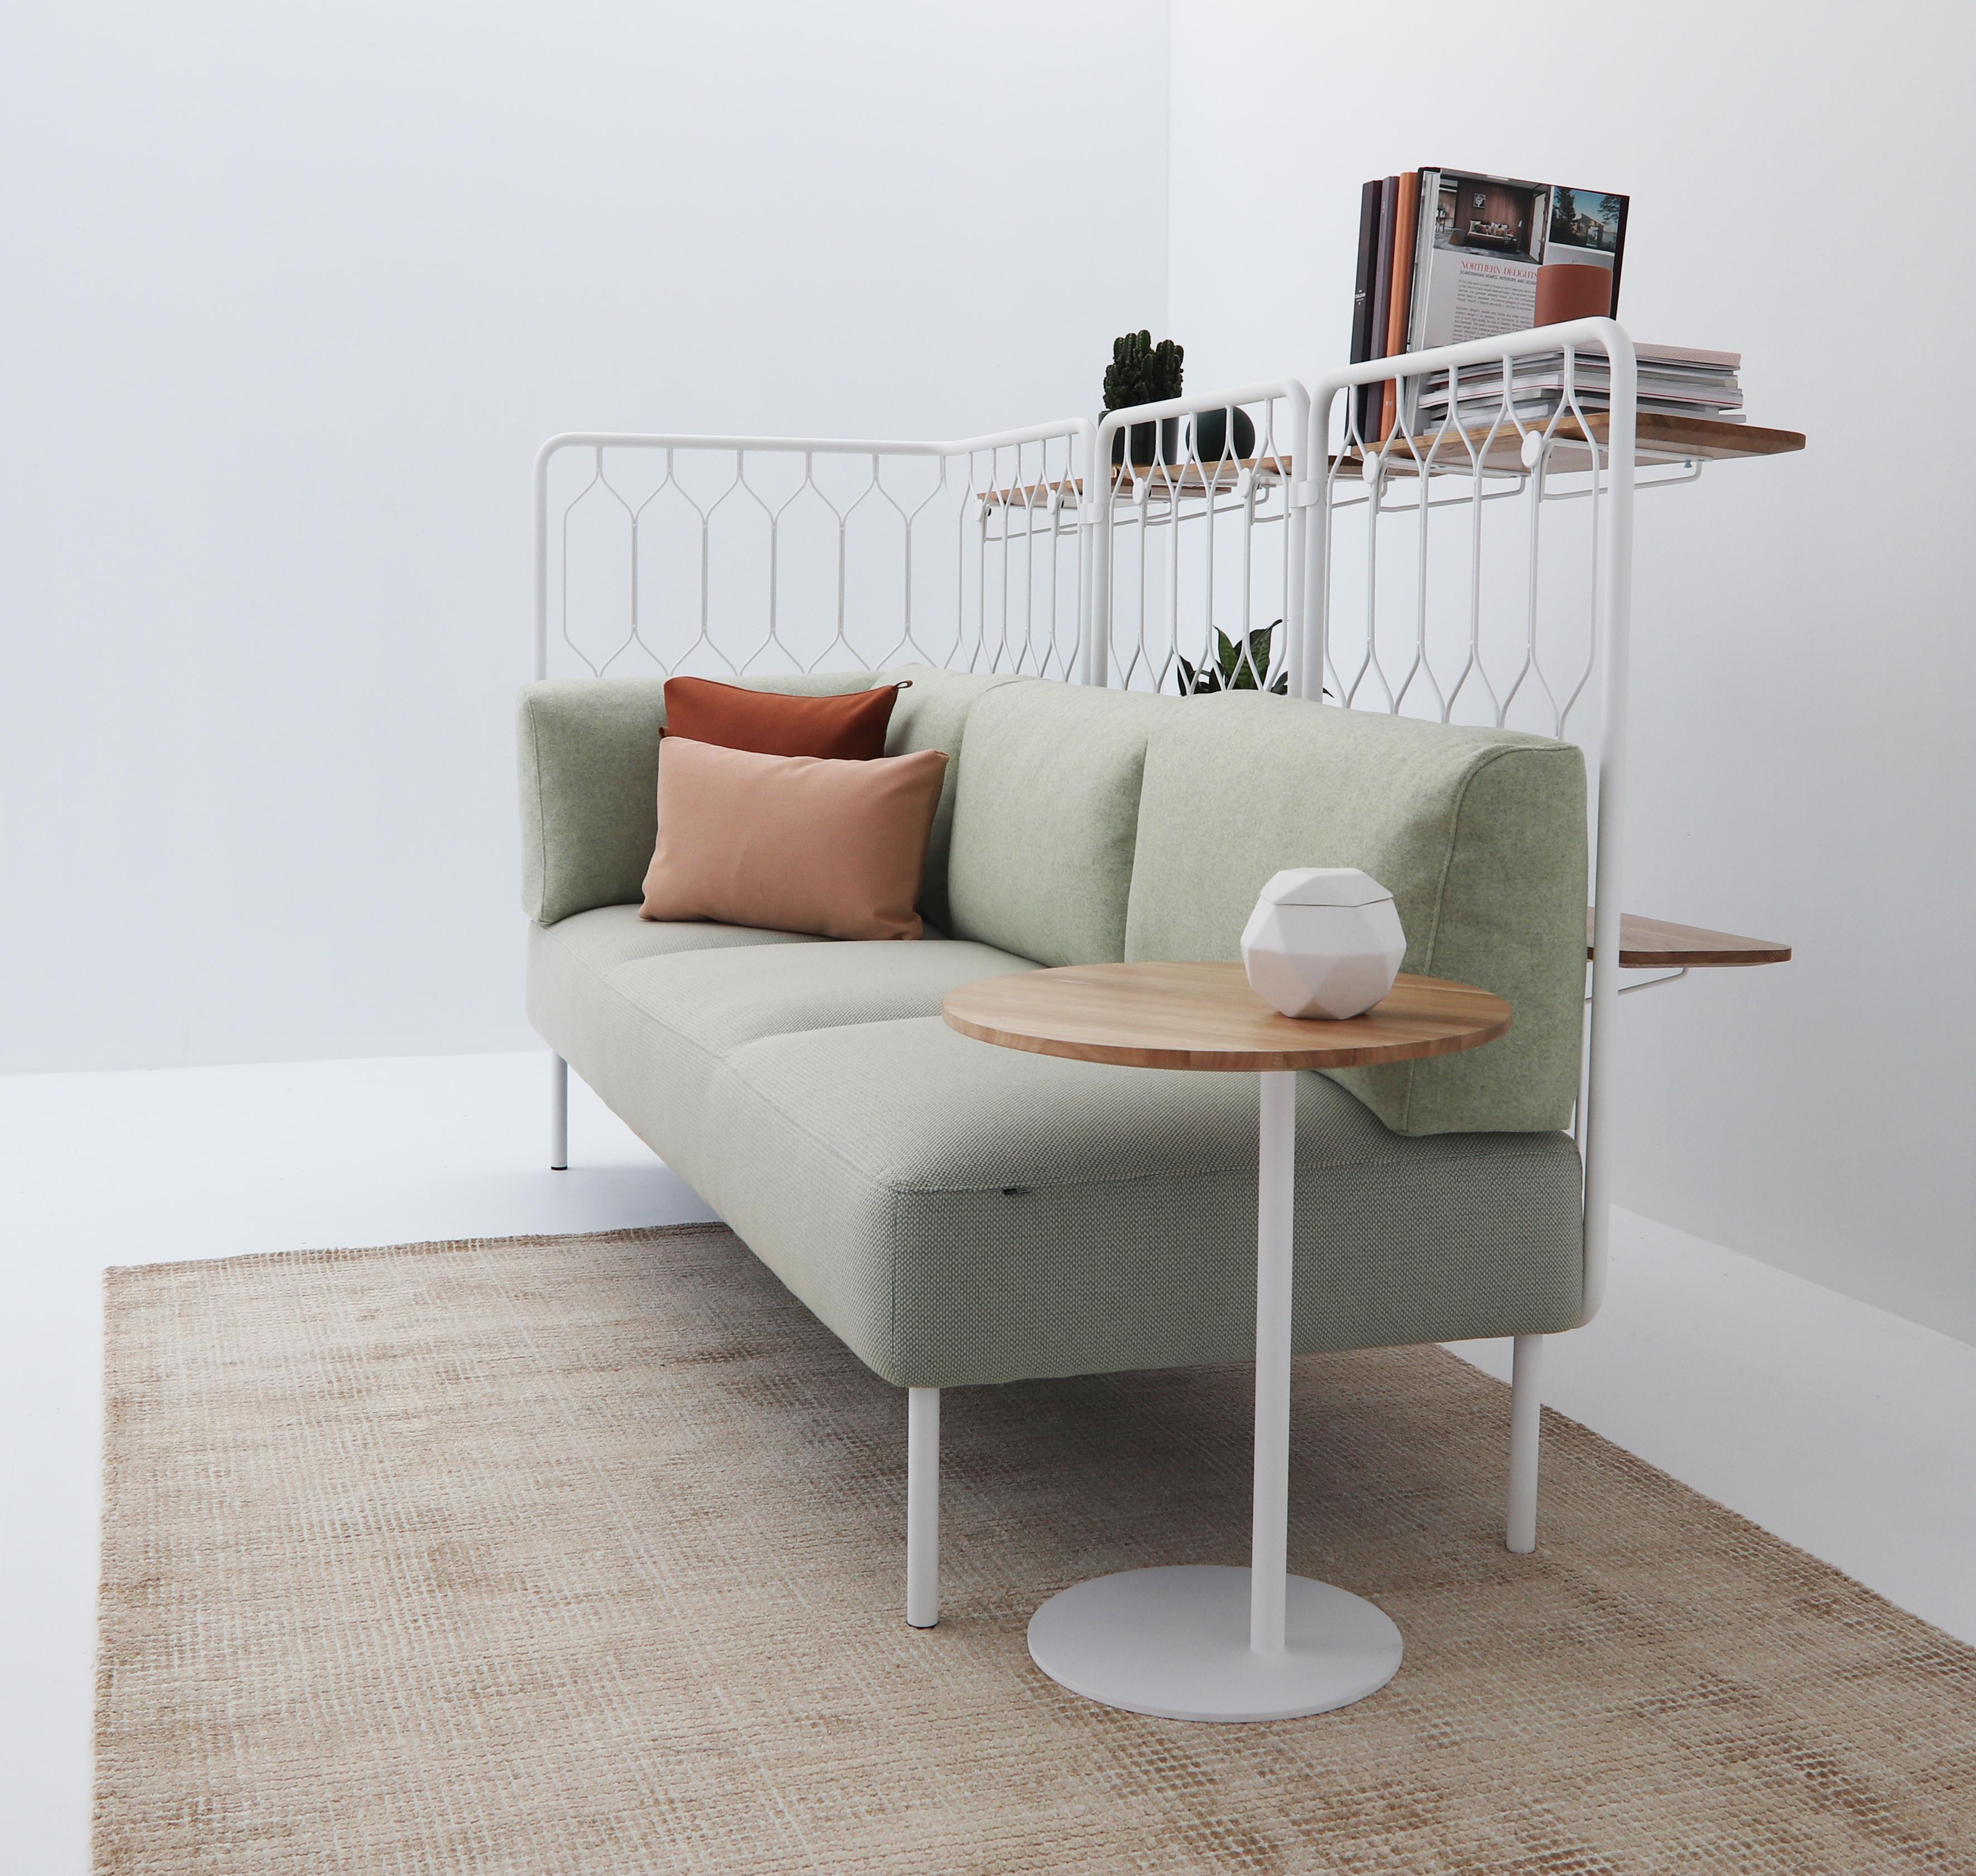 Kove sofa med hyller Fora Form puter og S bord